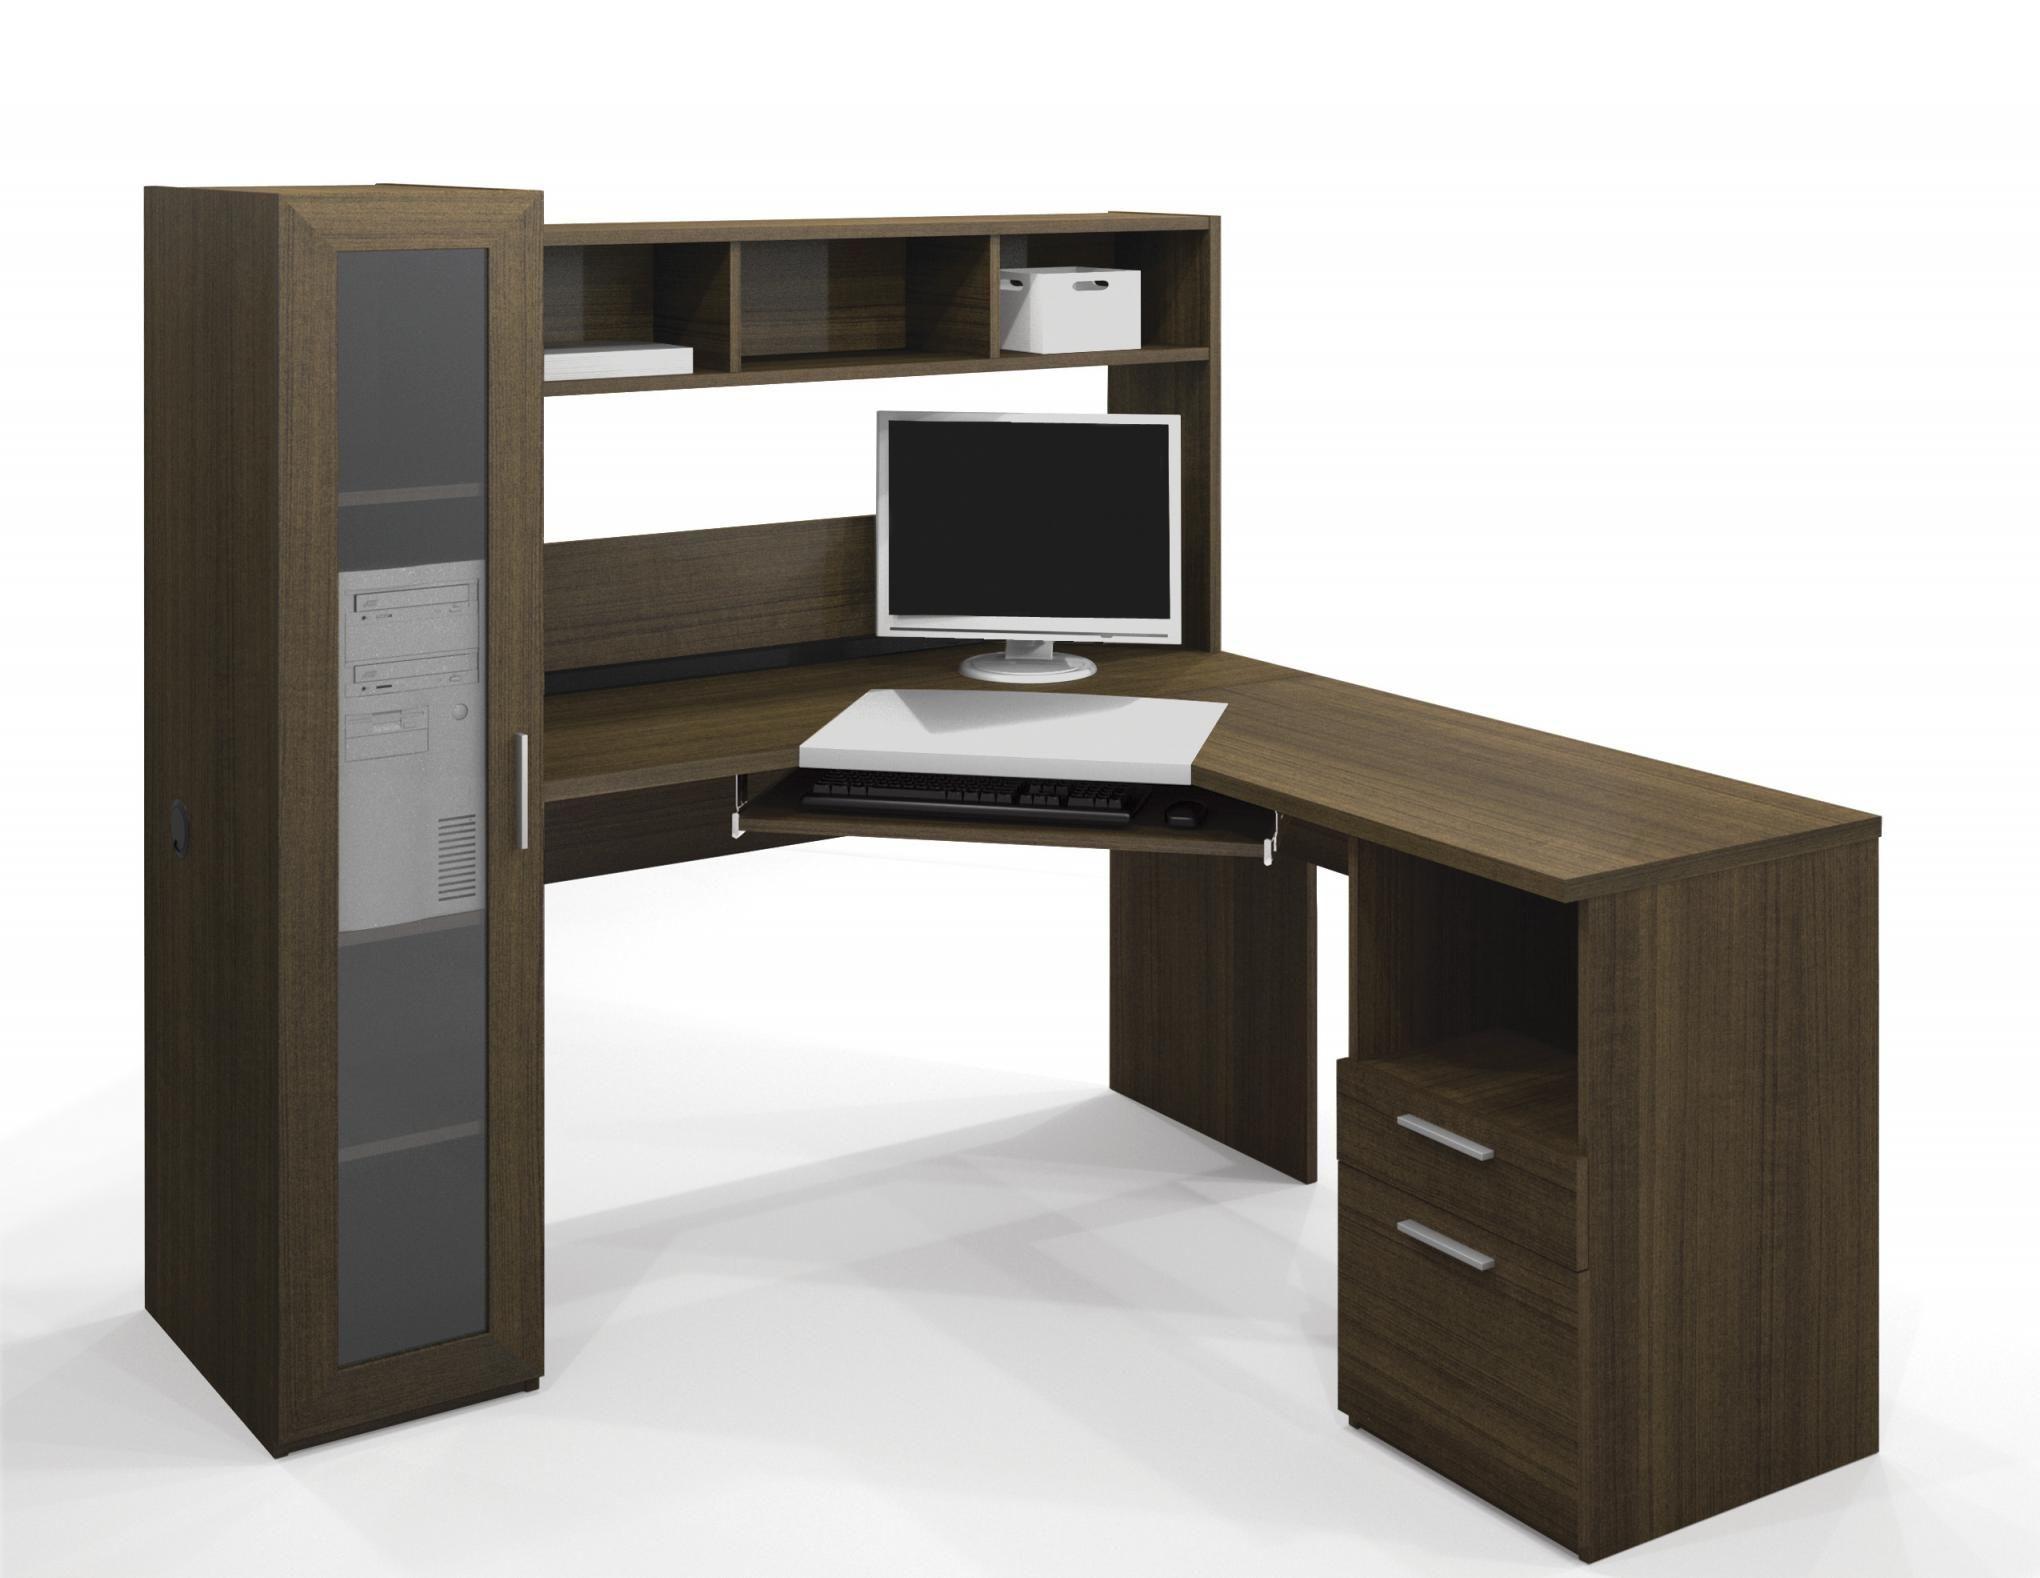 Interesting Stylish Corner Desk Modern Laminate Wood Construction Walnut And For Your Corner Workstation Office Desk For Sale Corner Workstation Desk